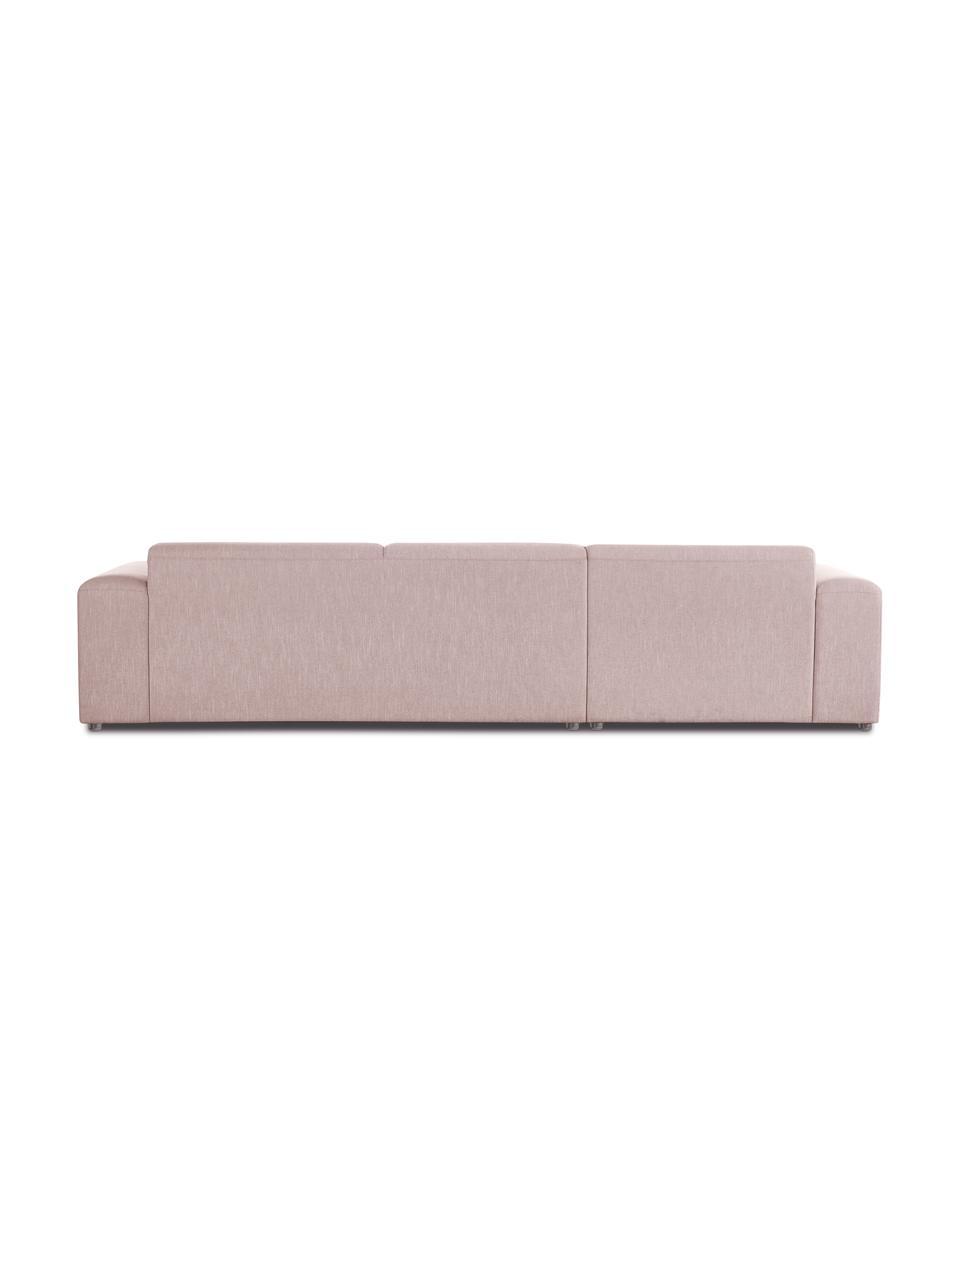 Hoekbank Melva (4-zits) in roze, Bekleding: 100% polyester, Frame: massief grenenhout, FSC-g, Poten: kunststof, Geweven stof roze, B 319 x D 196 cm